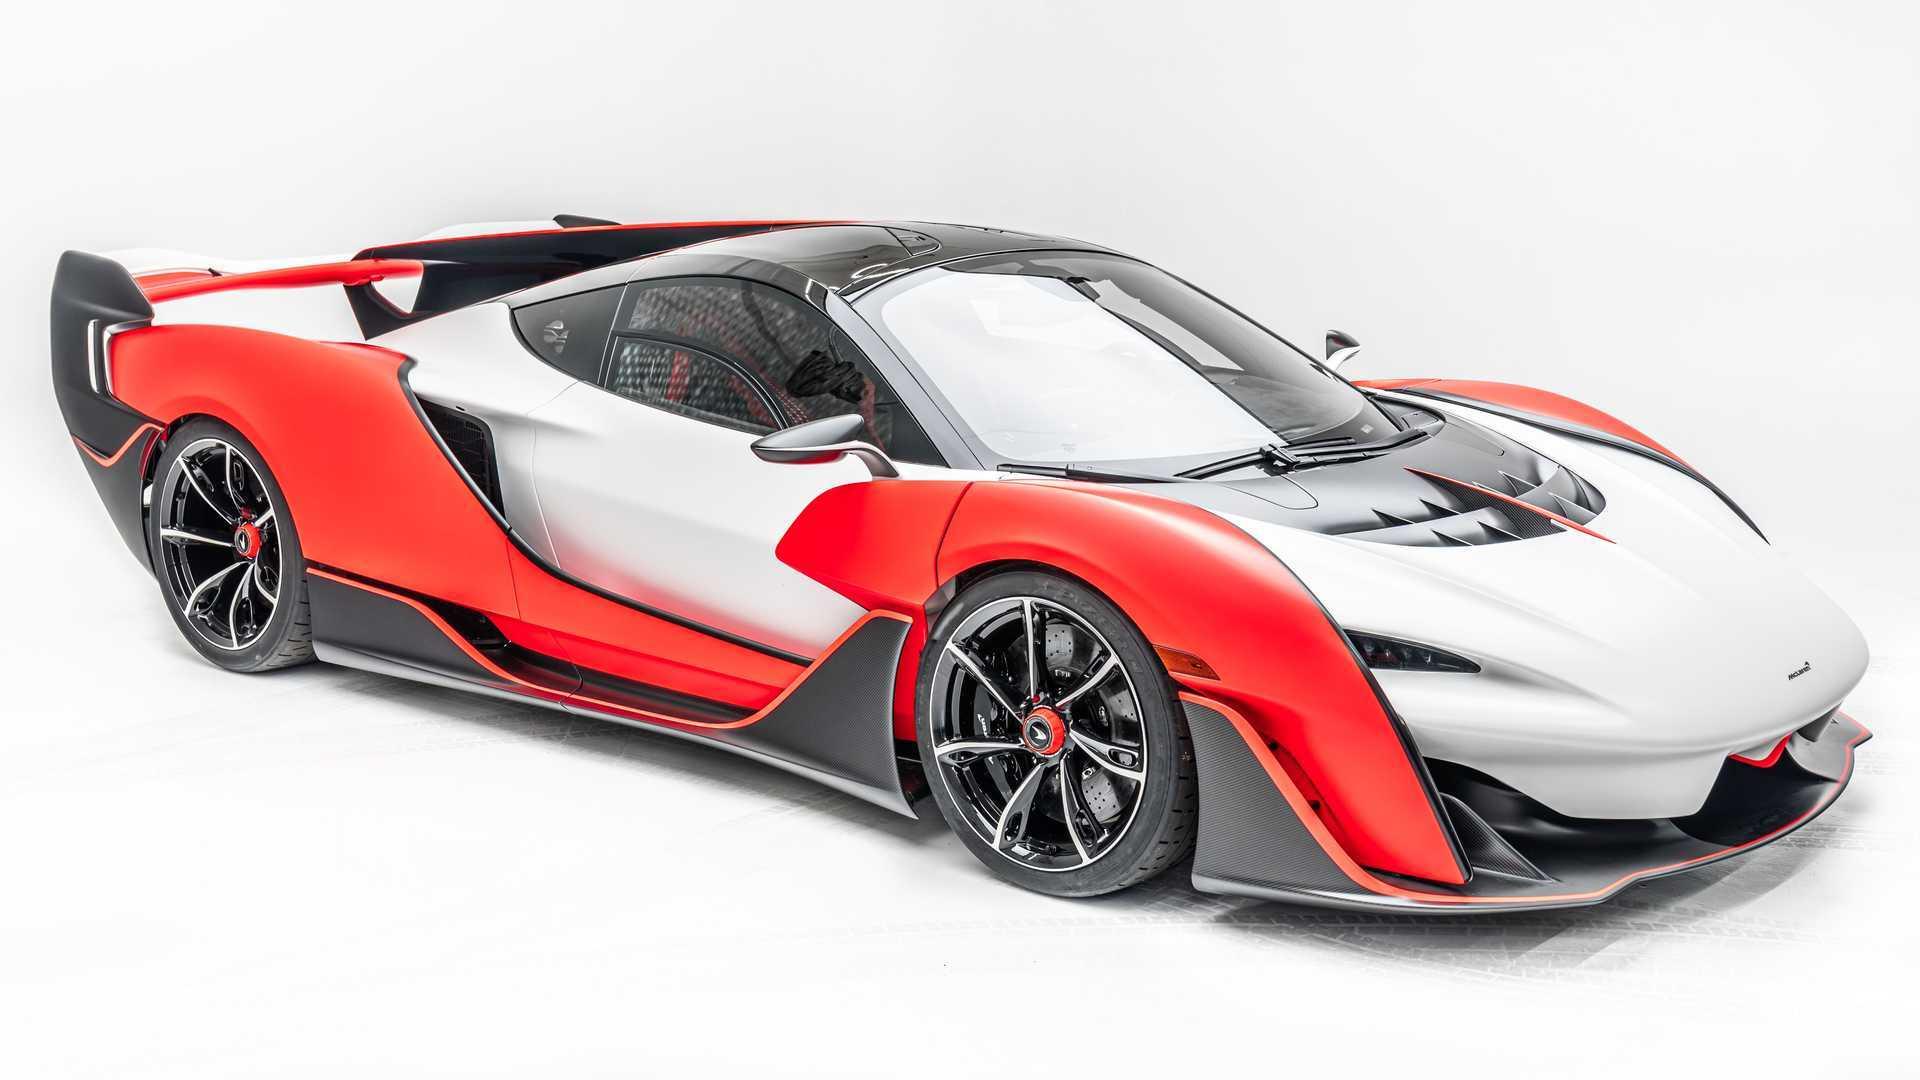 2021 McLaren Sabre Profile